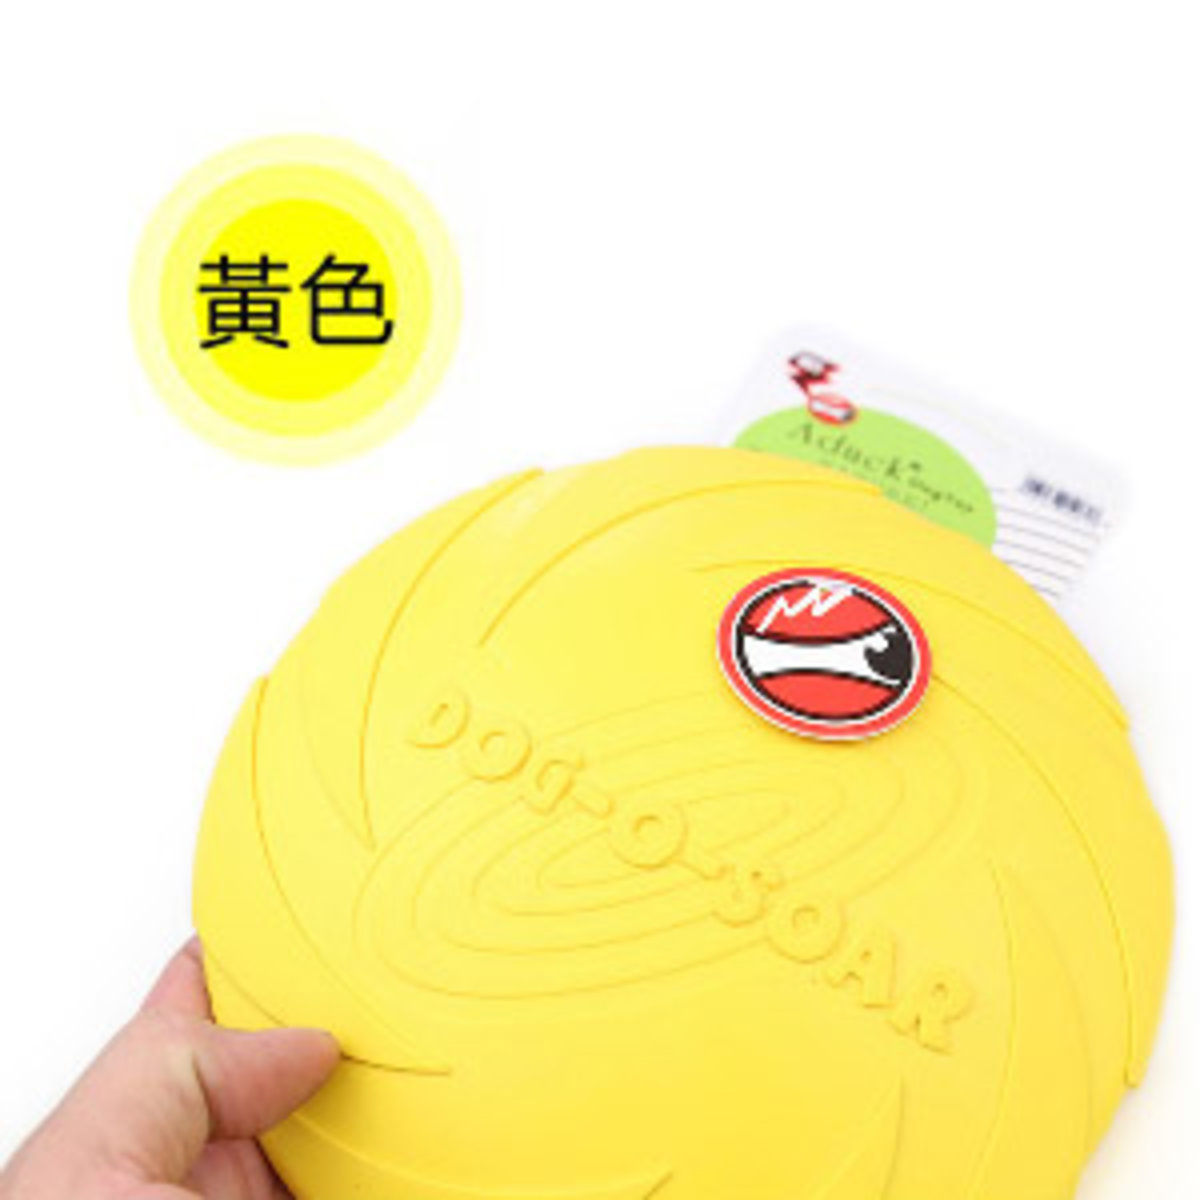 Aduck 手拋型橡膠飛盤狗狗訓練玩具 (黃)